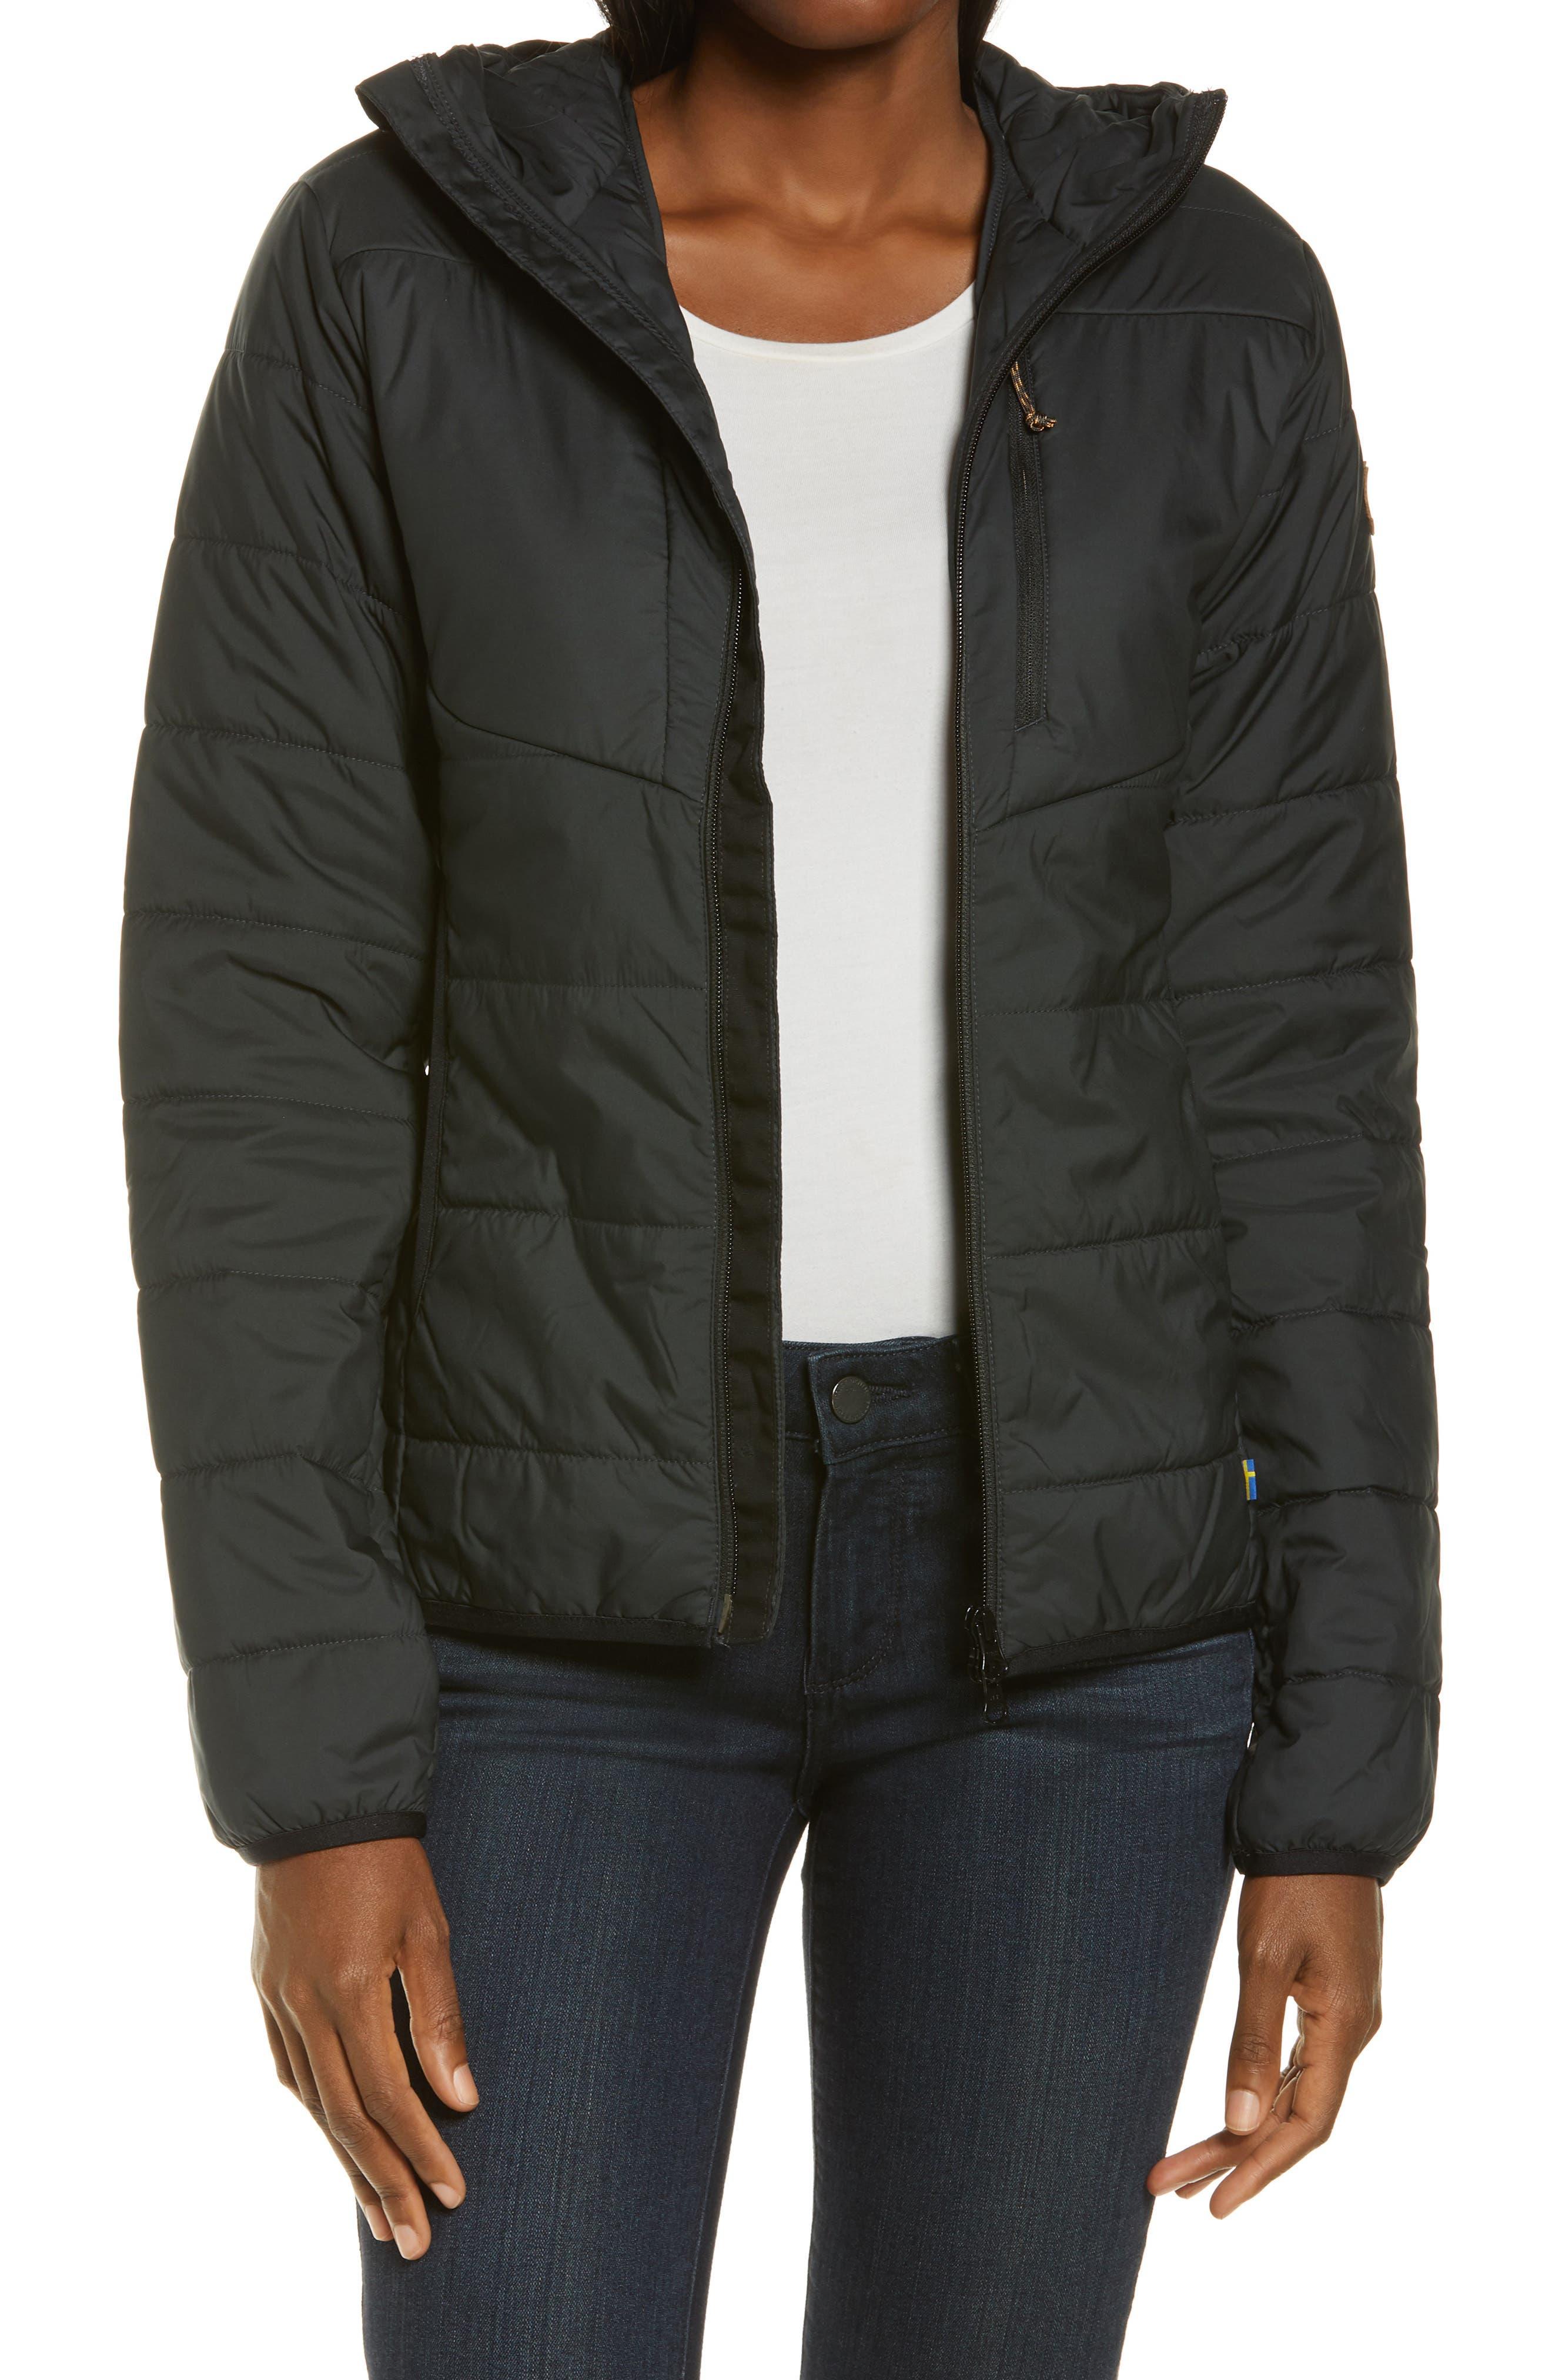 Ked Insulated Jacket